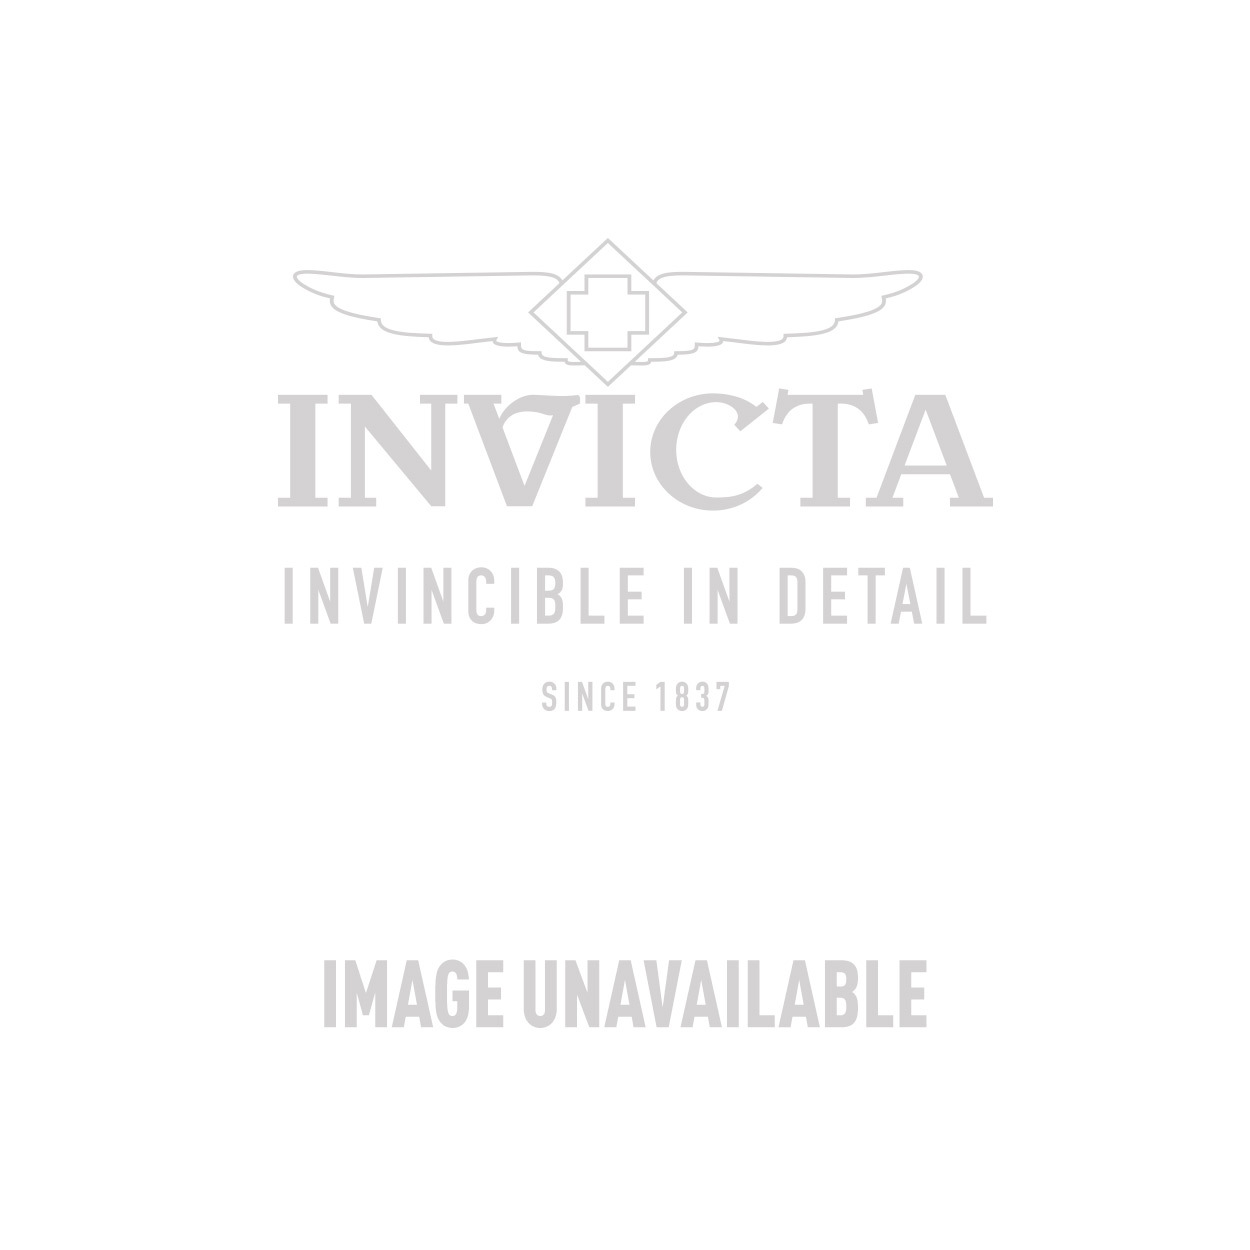 Invicta Sea Hunter  Quartz Watch - Rose Gold, Black case with Black tone Leather band - Model 11167